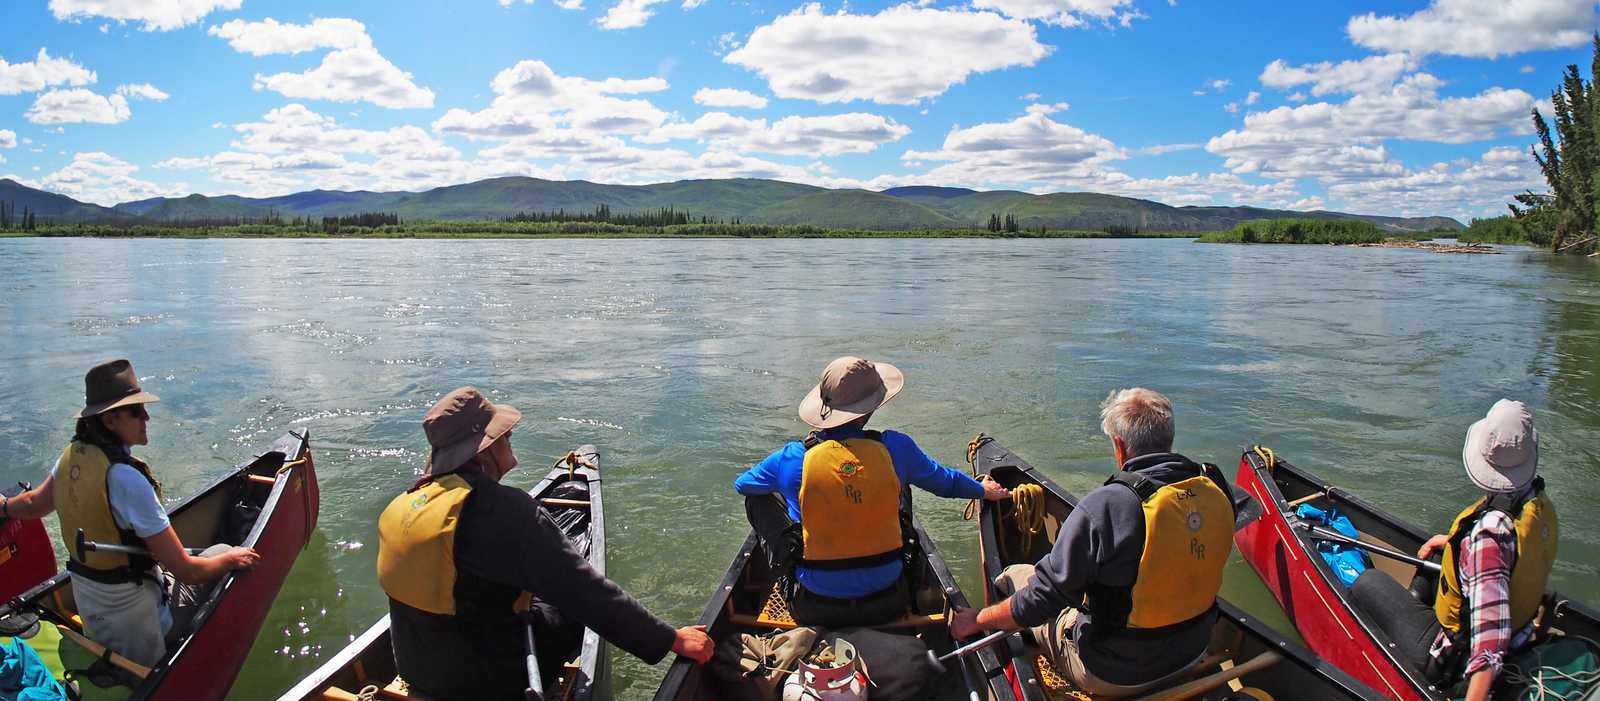 Kanutour auf dem Yukon River von Lake Laberge to Dawson City; Yukon Territory